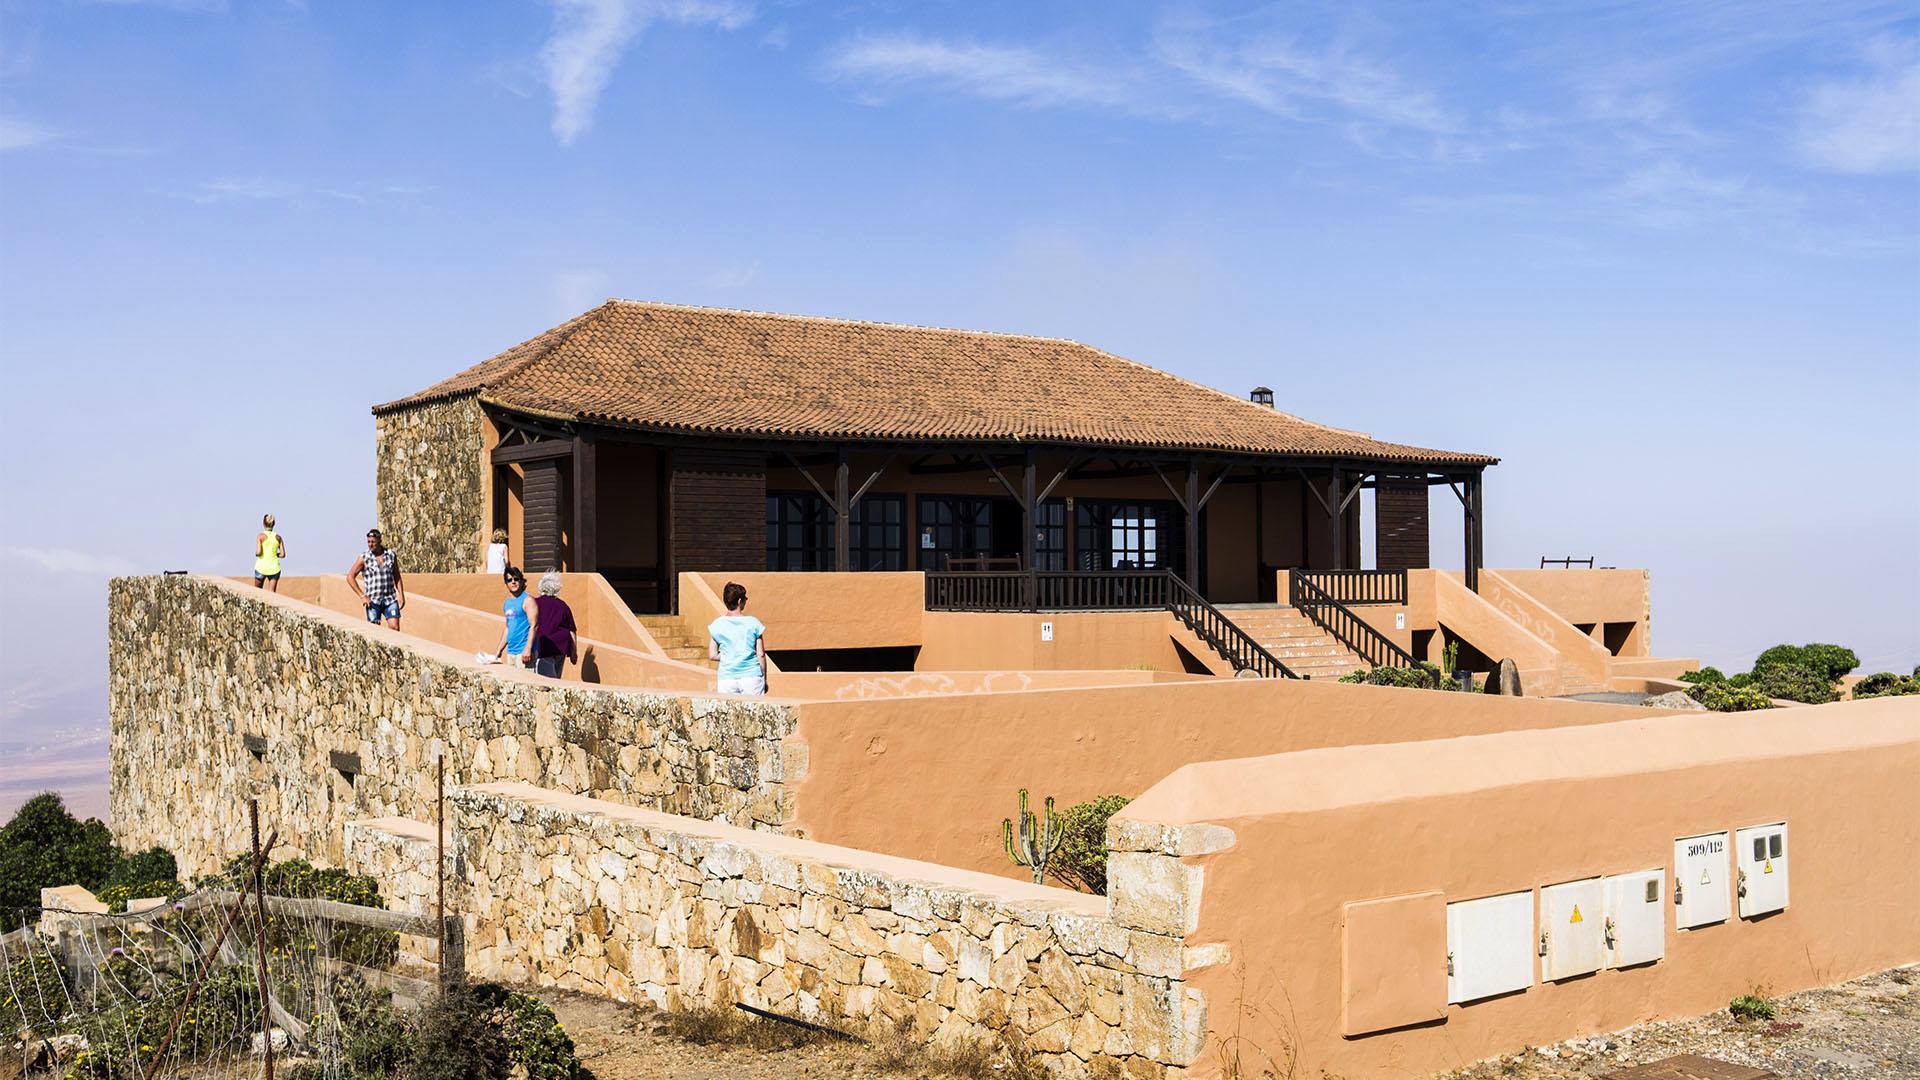 Sehenswürdigkeiten Fuerteventuras: Betancuria – Mirador de Morro Velosa